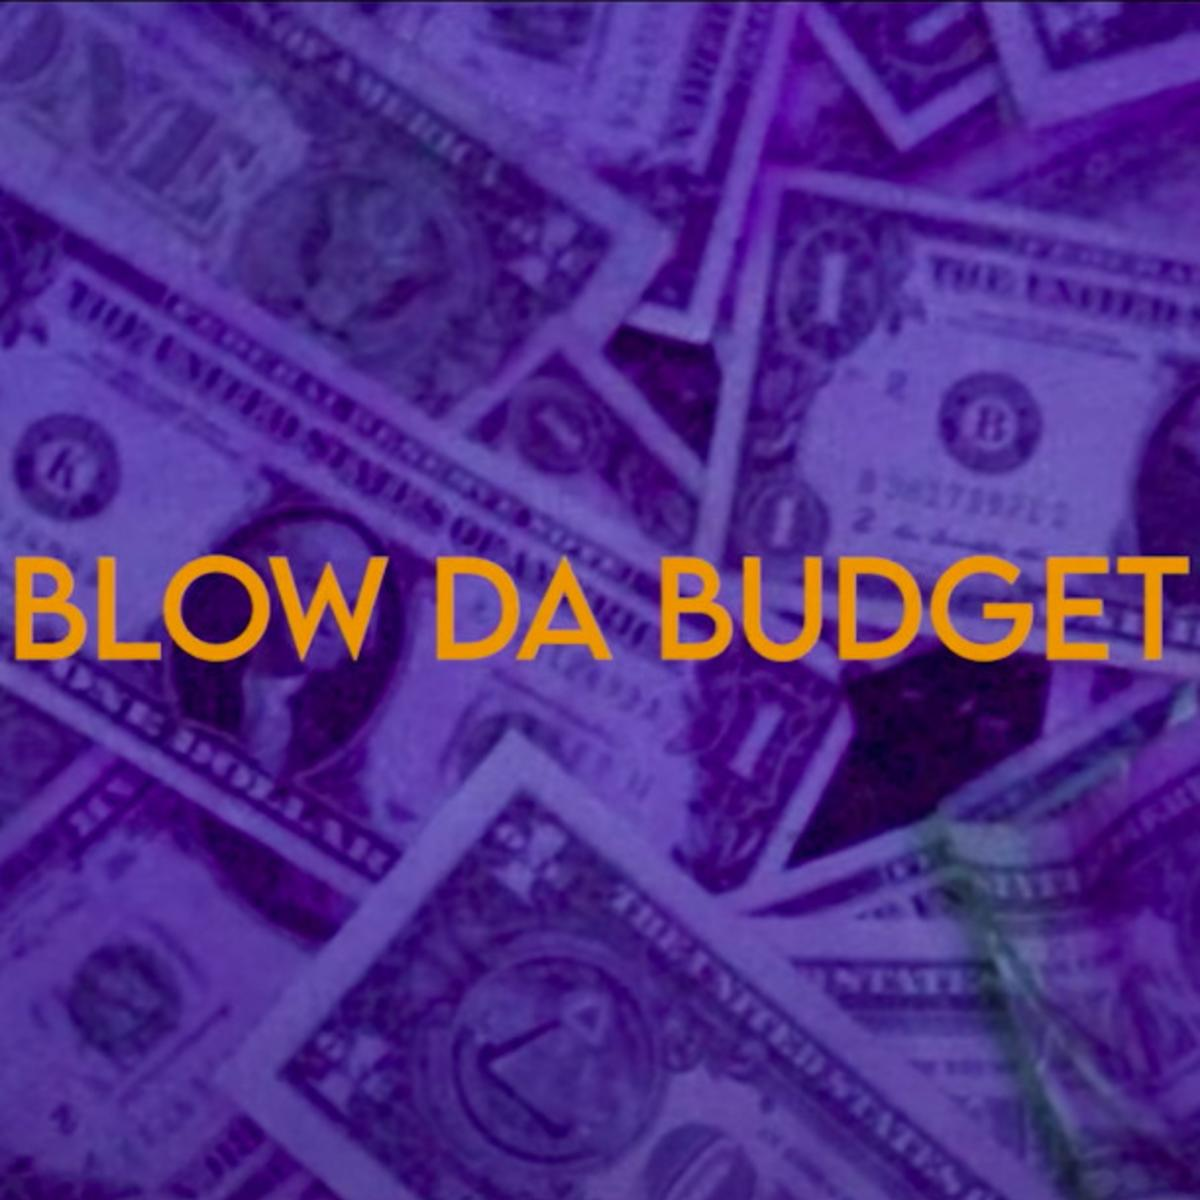 MP3: K Camp - Blow Da Budget (Freestyle)